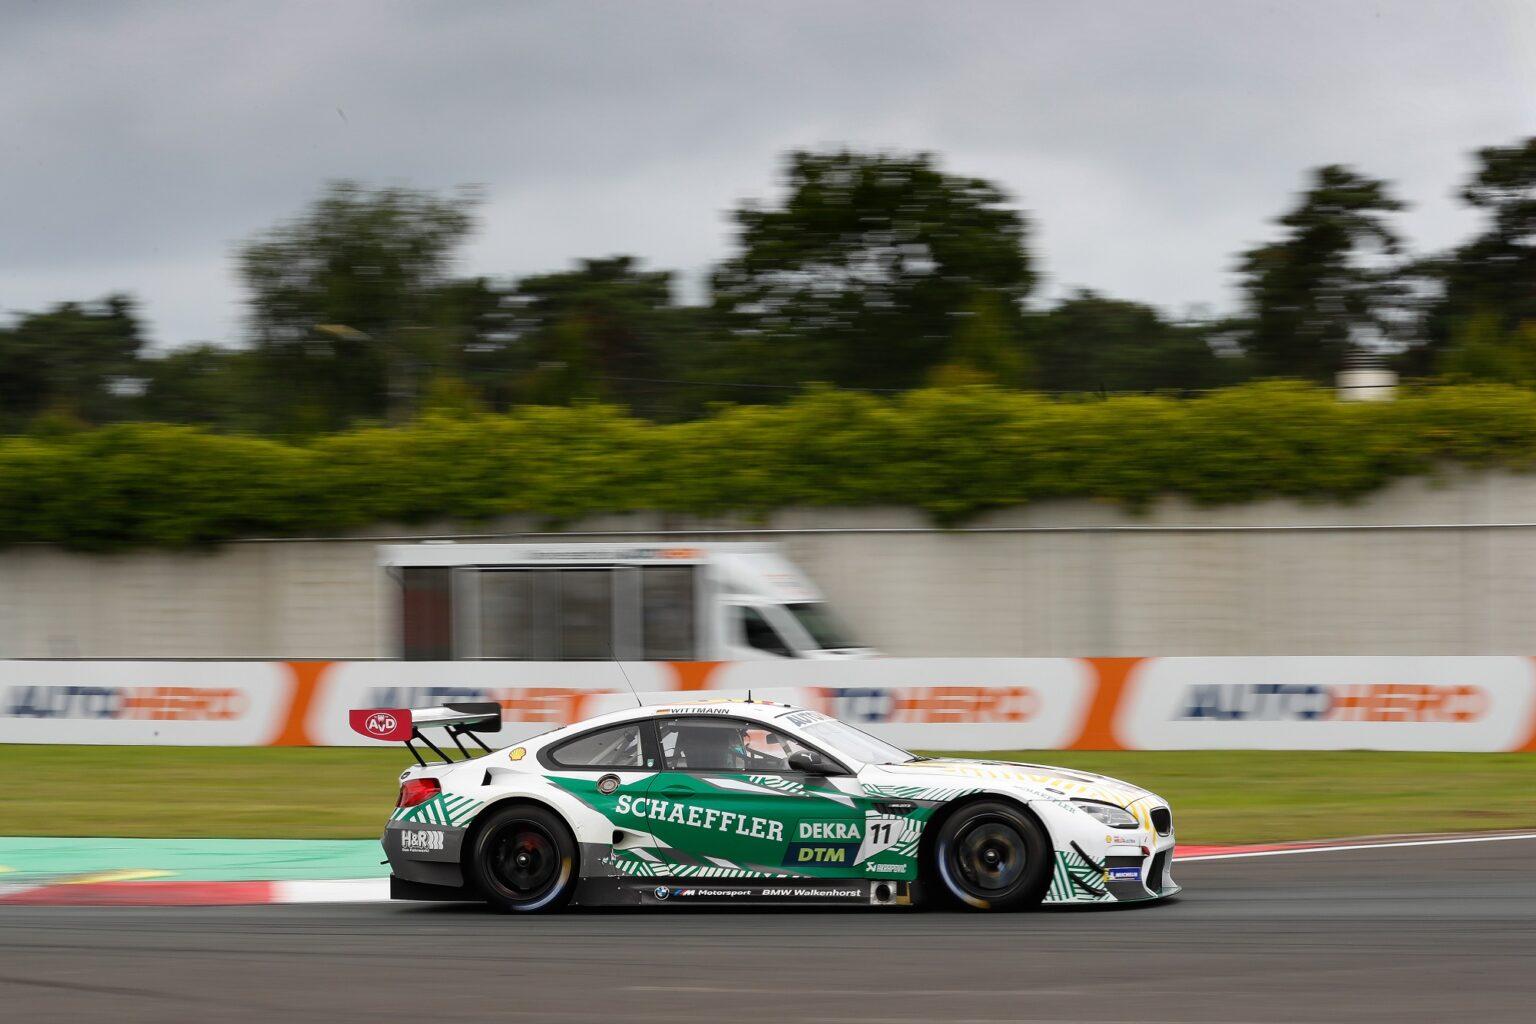 DTM: Debütsieg für Walkenhorst Motorsport - gt-place.com